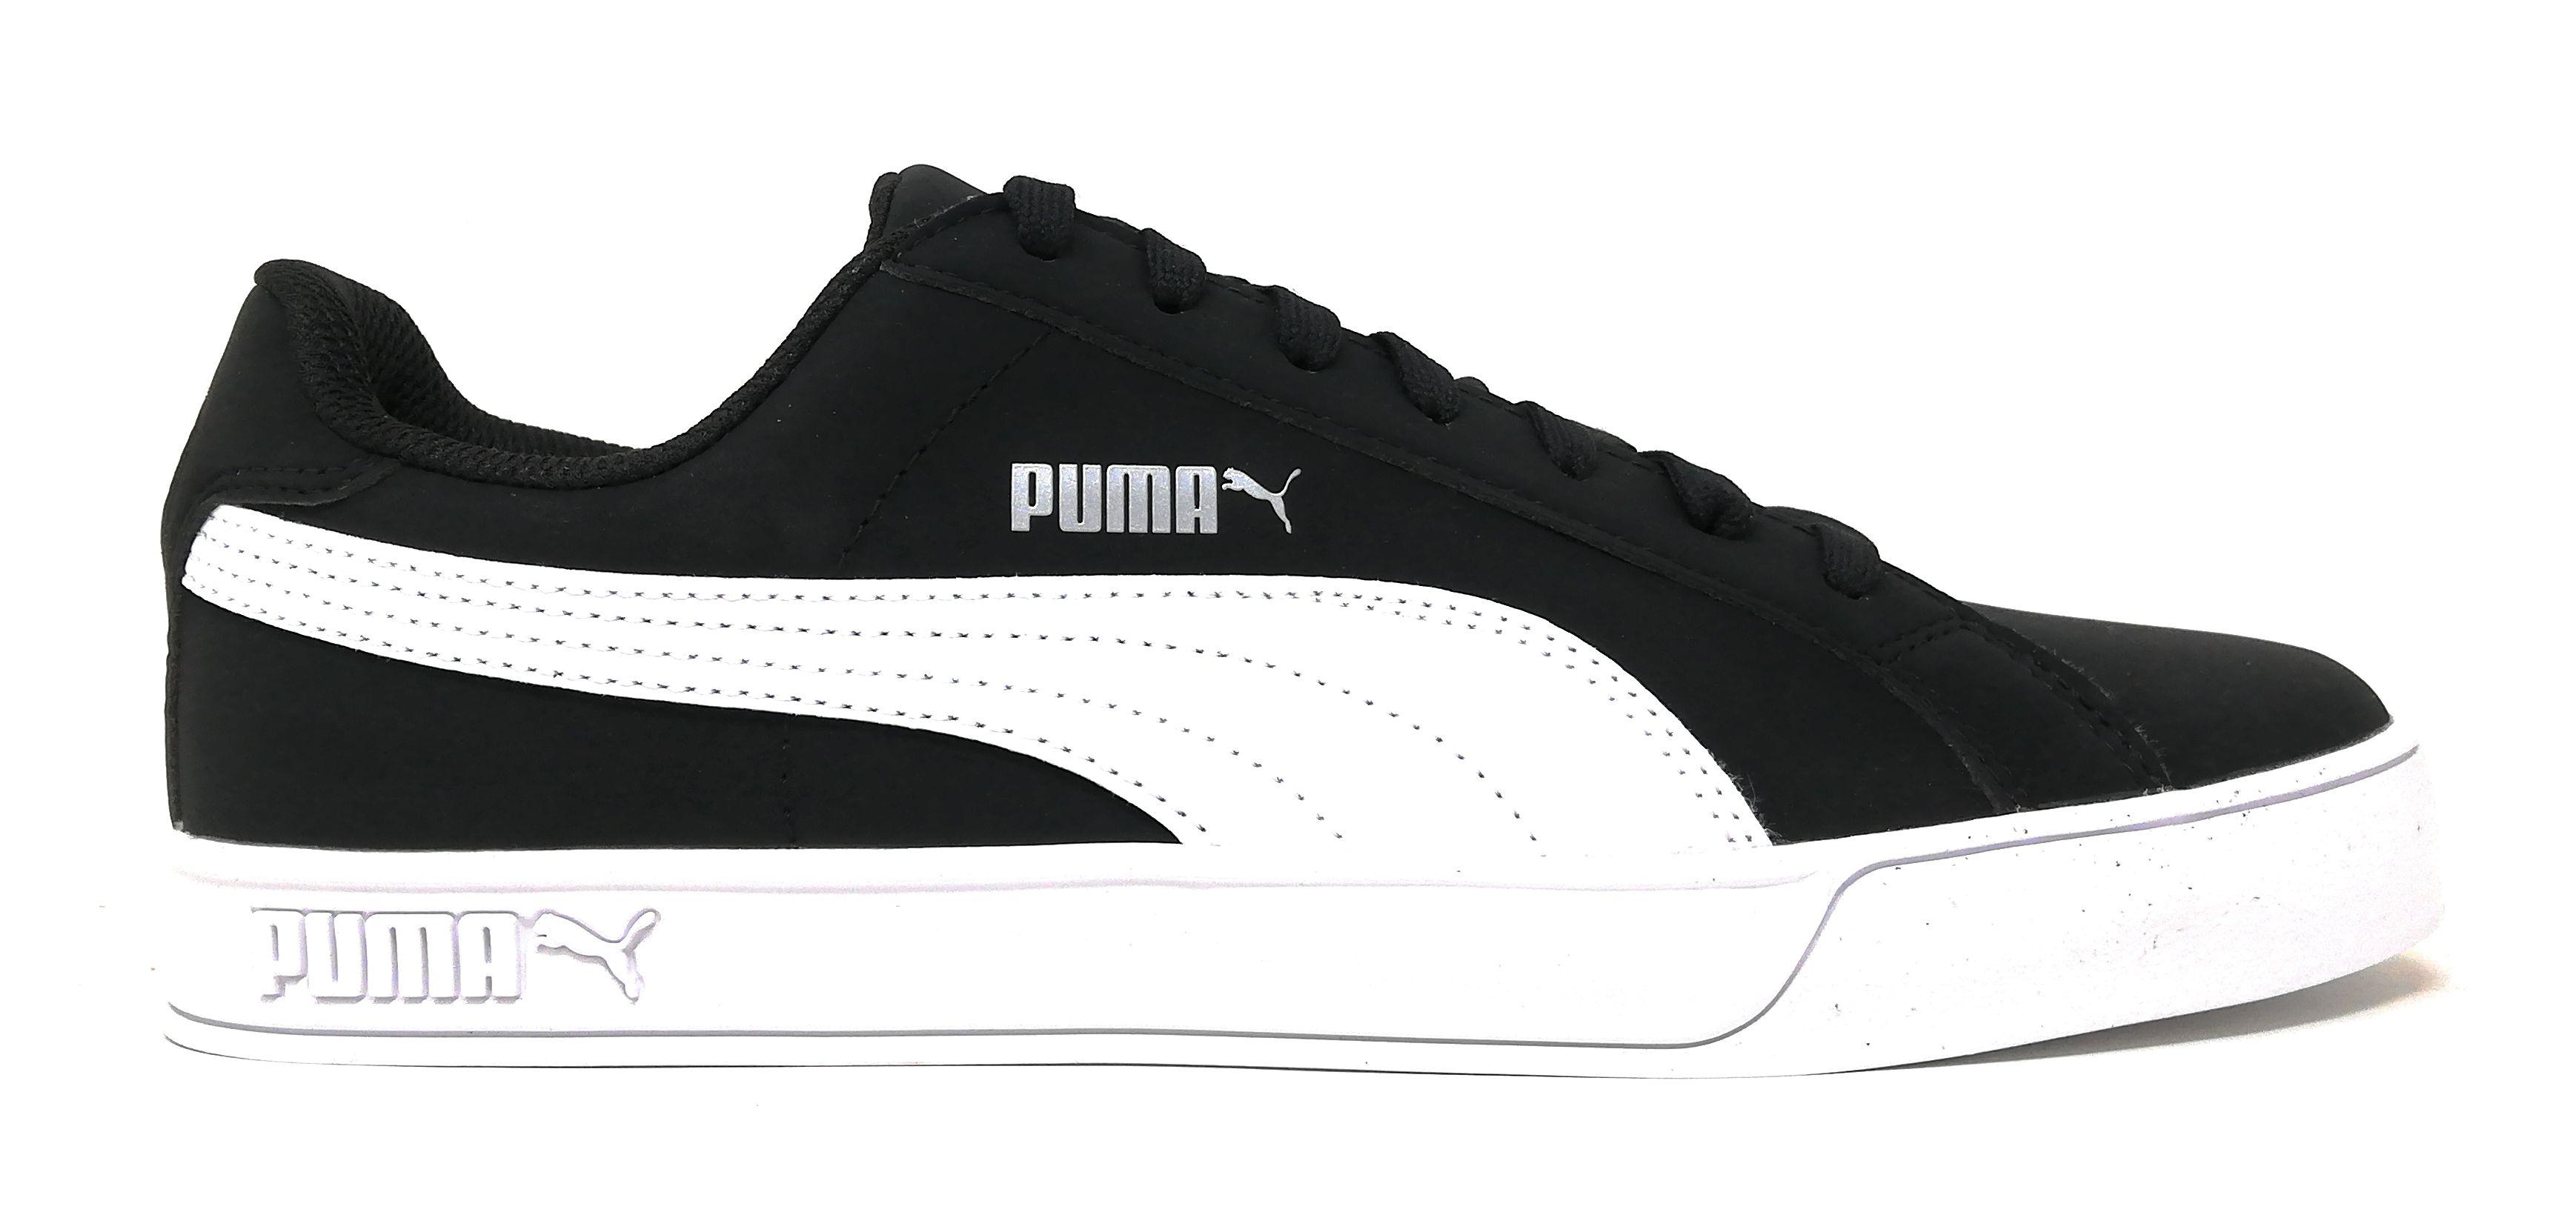 Scarpa da ginnastica PUMA SMASH VULC Uomo black-white  7e7249c6d42